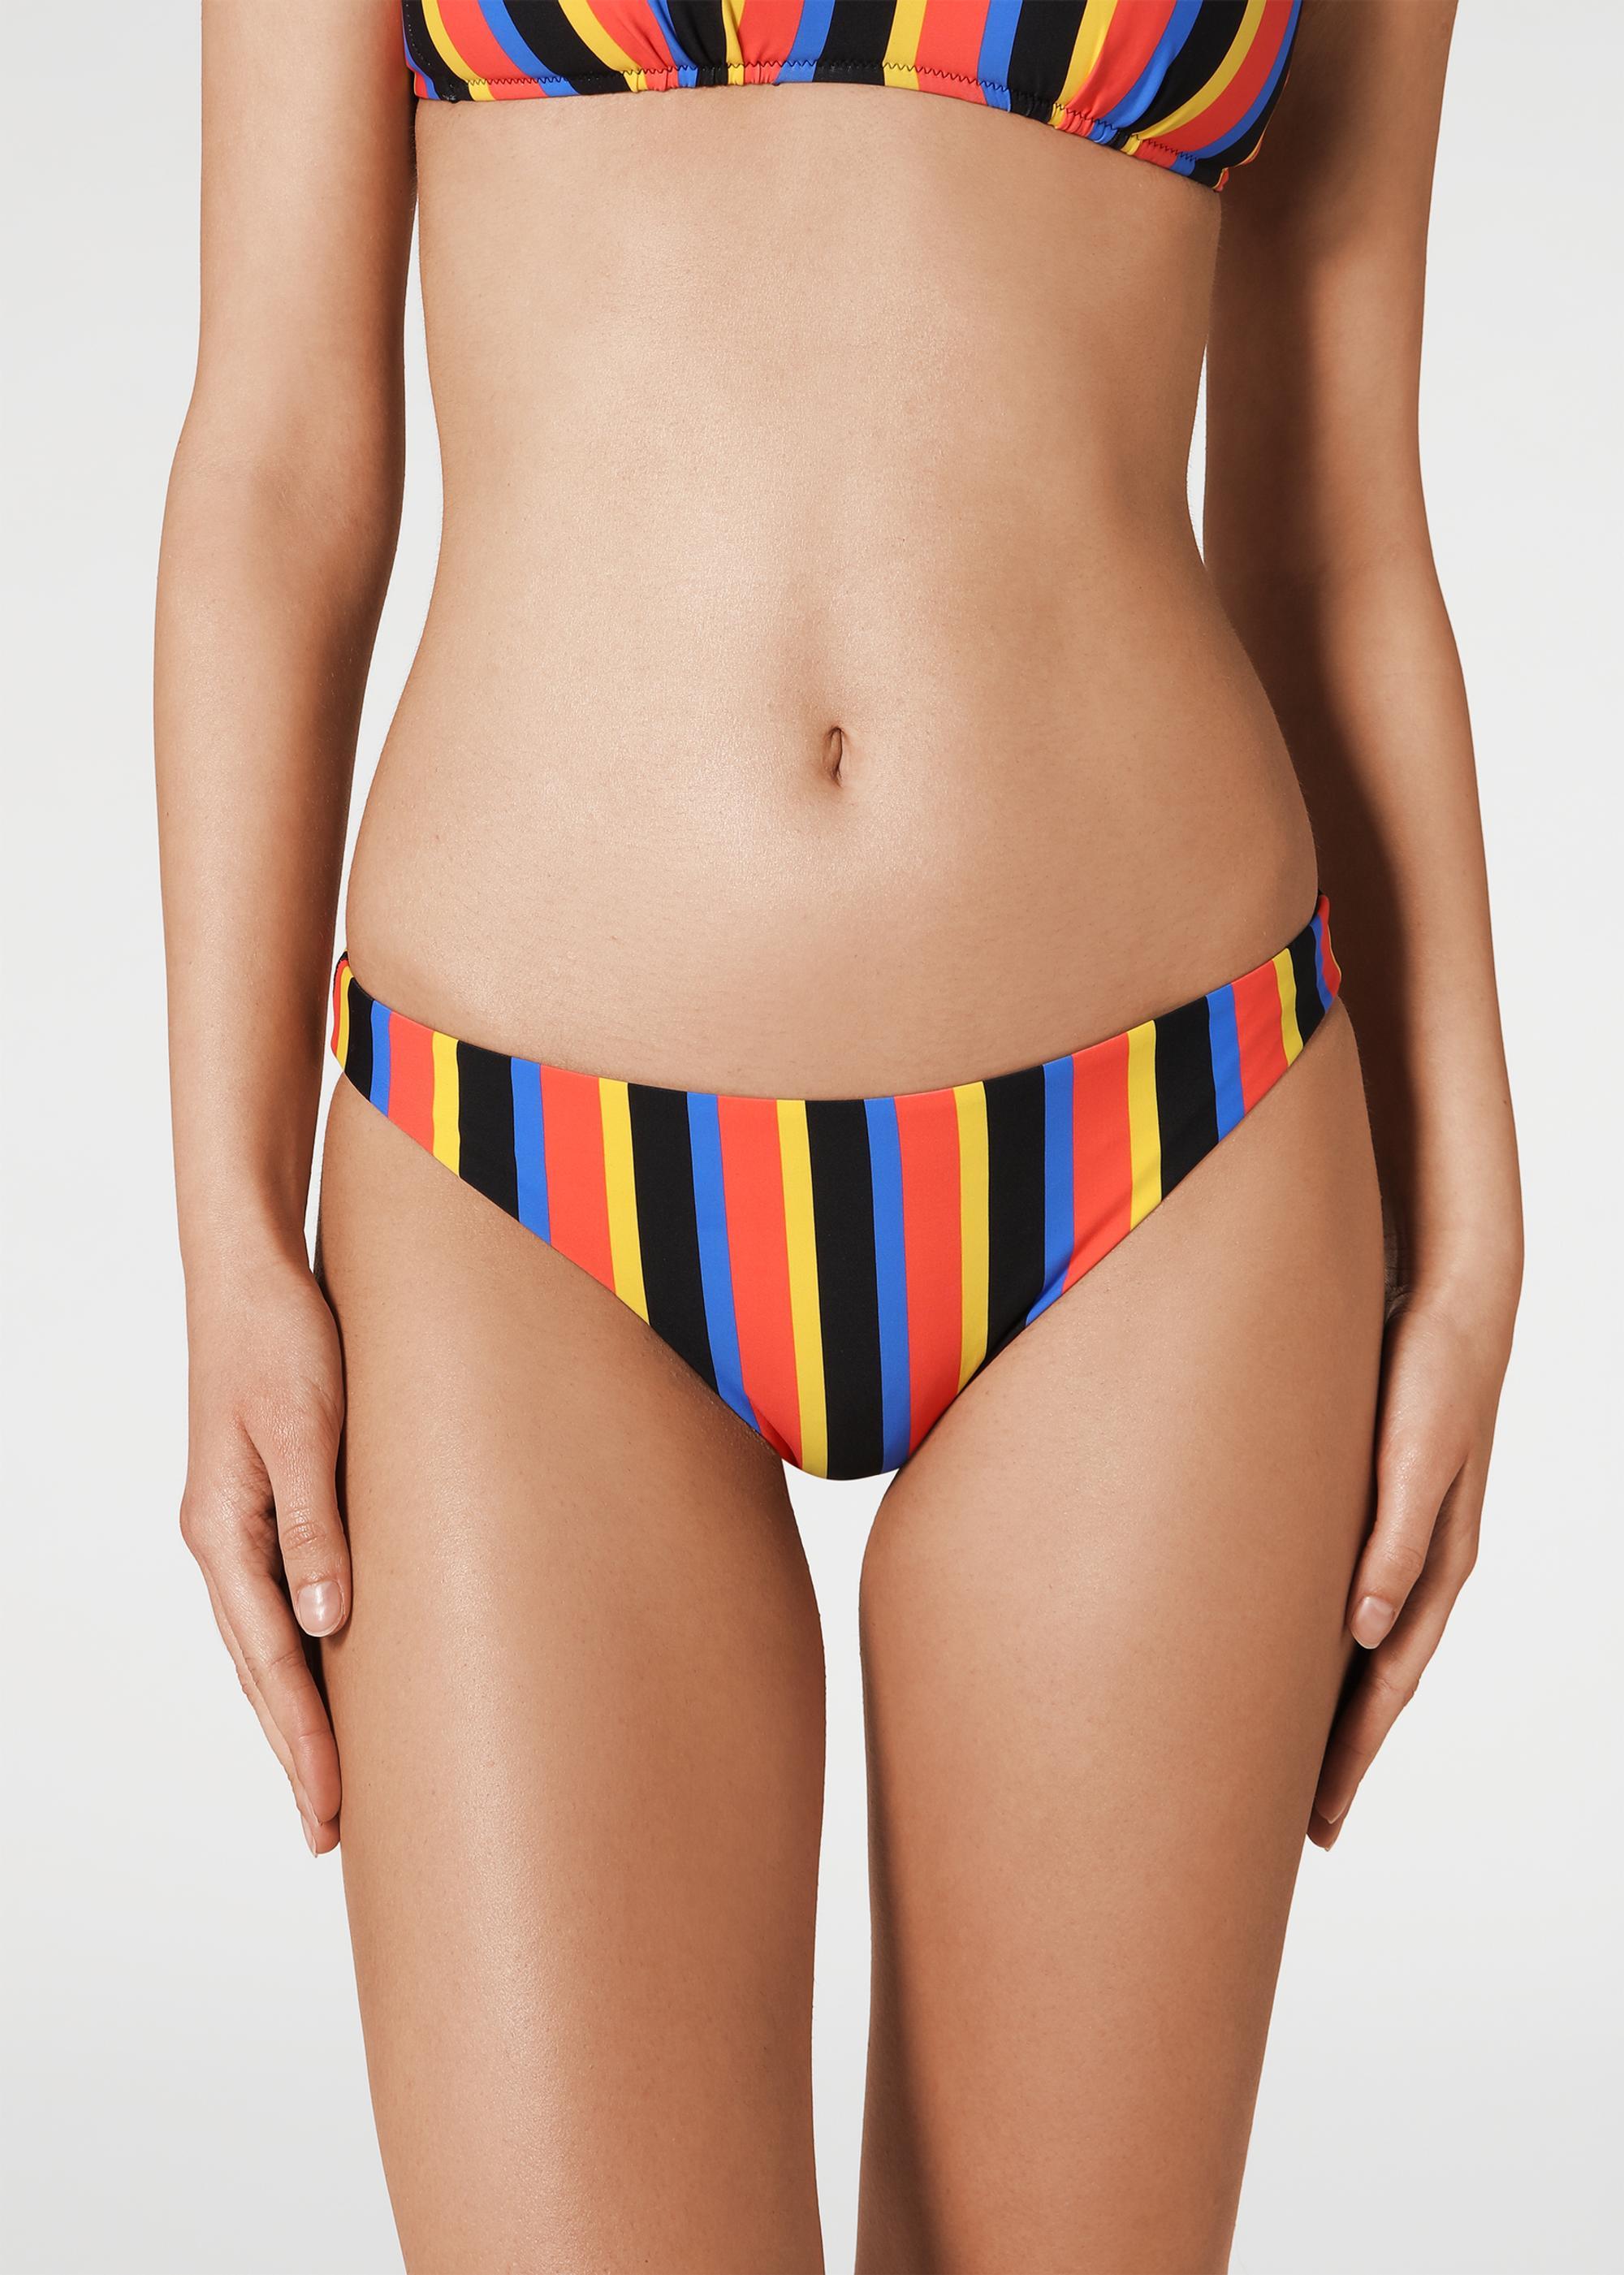 cd4995008f22 Braguita de bikini Sonia a rayas - Calzedonia